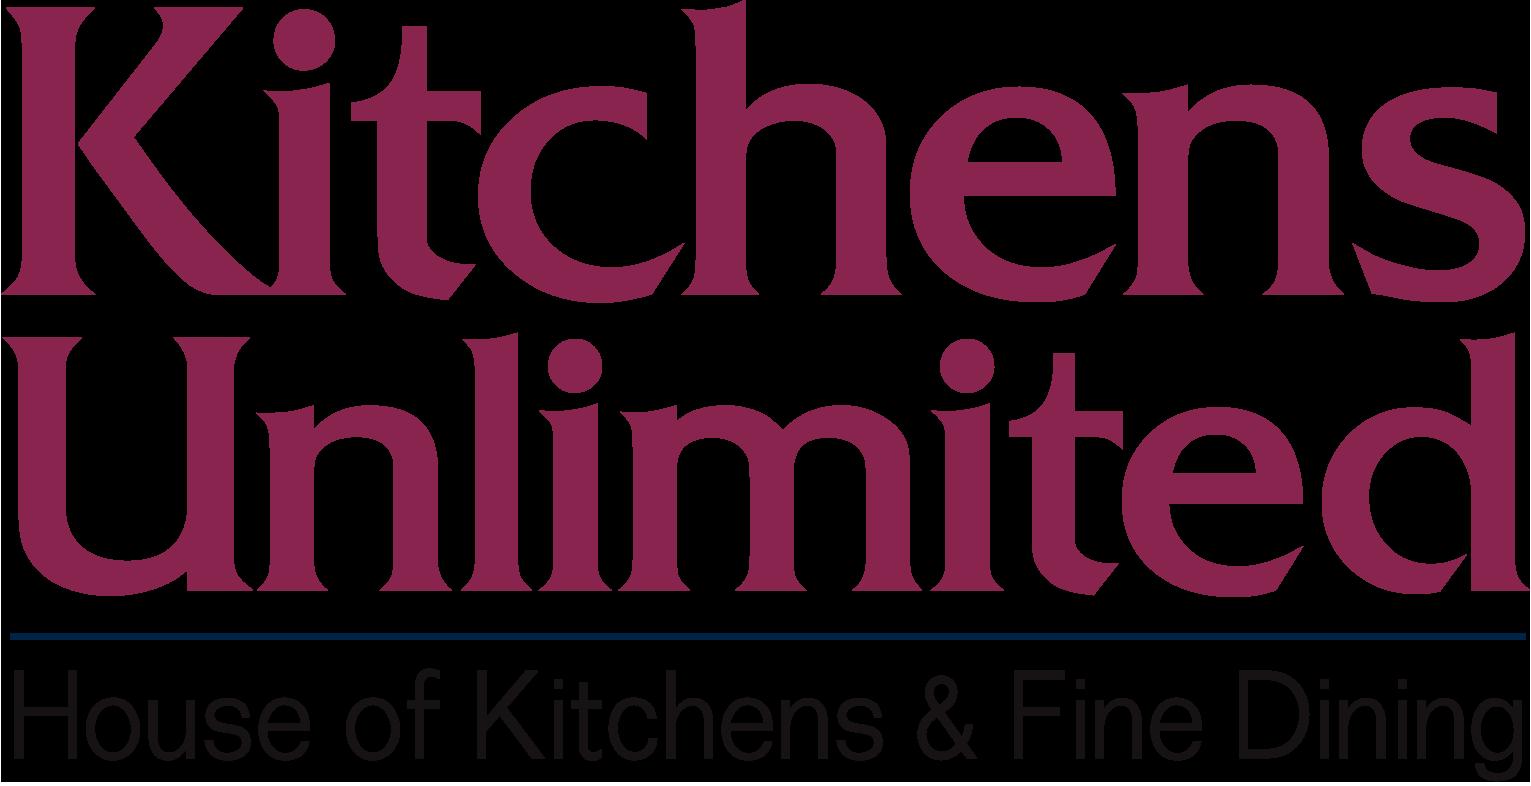 Kitchen's Unlimited